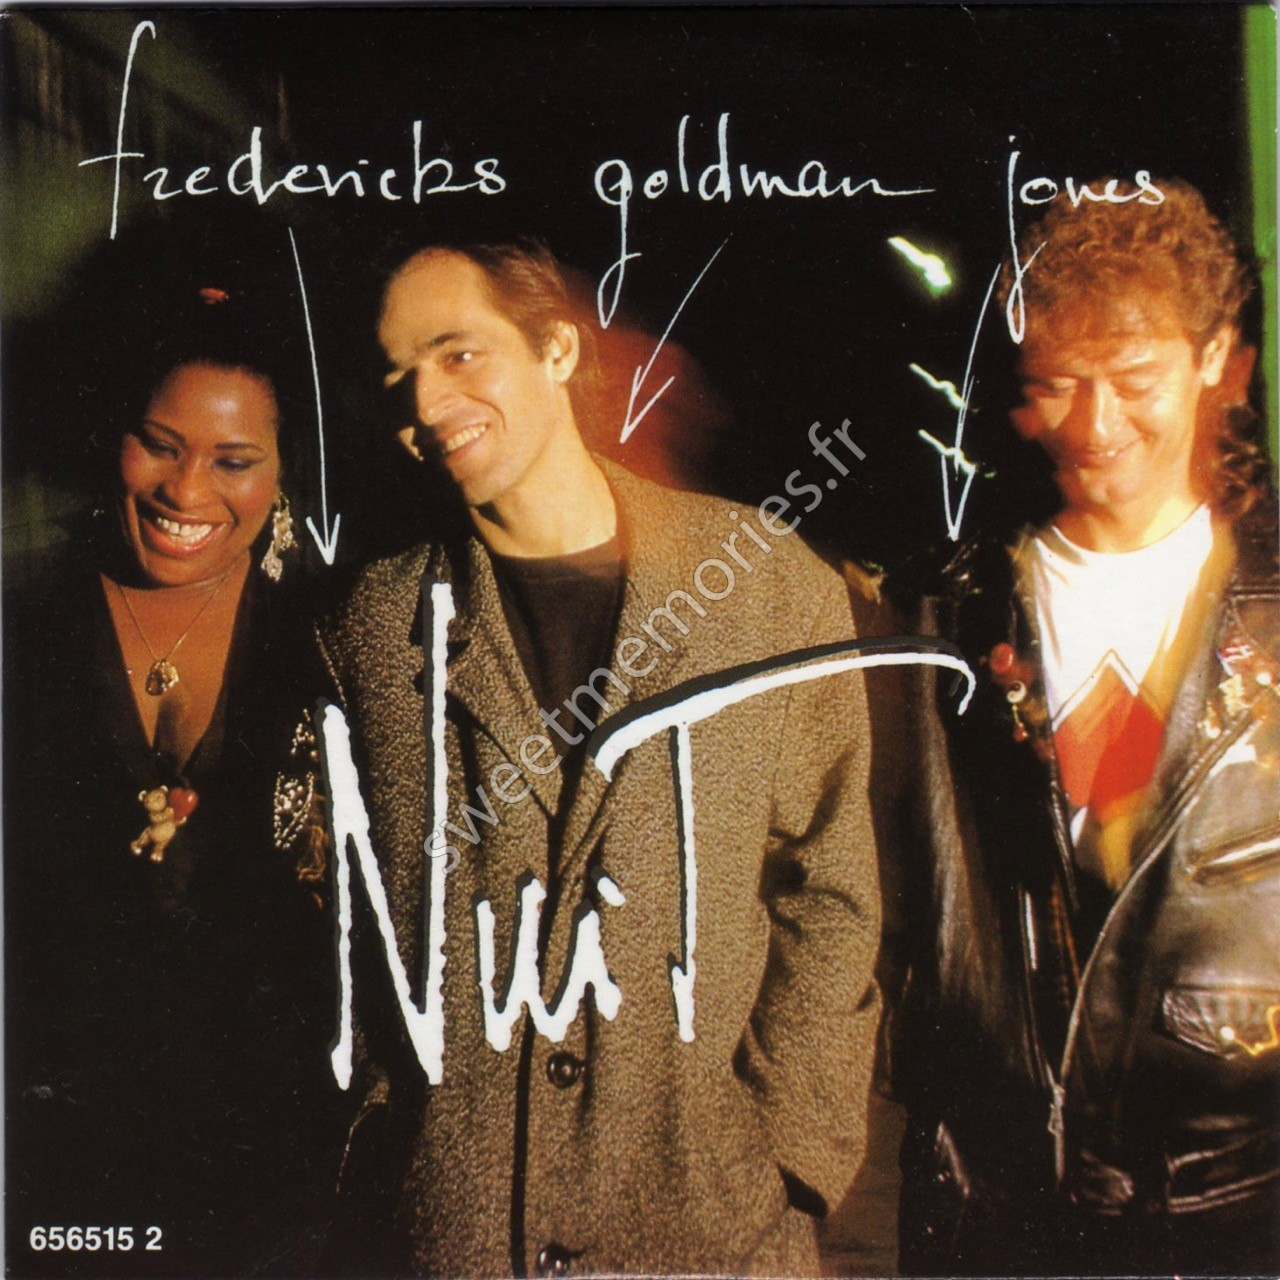 Fredericks-Goldman-Jones – Nuit